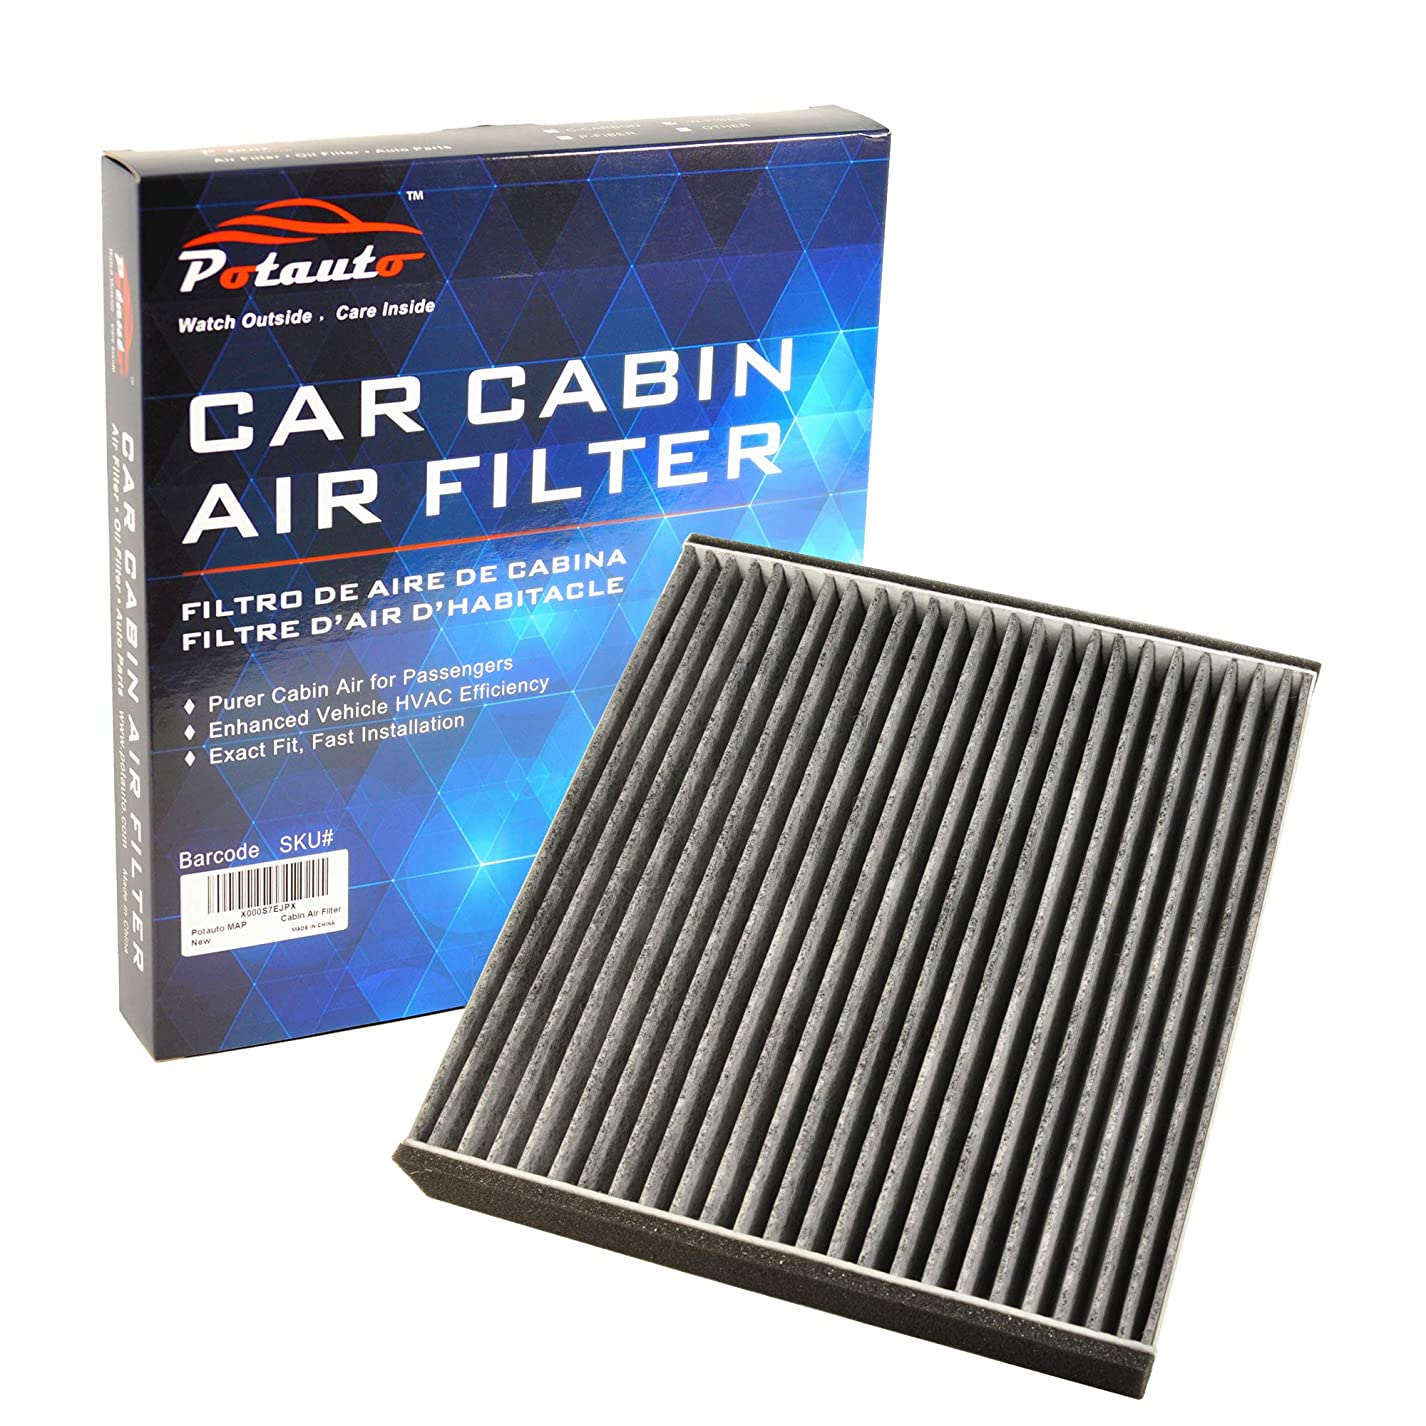 POTAUTO MAP 1016C (CF10562) Replacement Activated Carbon Car Cabin Air Filter for LEXUS, GS300, GS430, LS430, SC430 luh212756248905